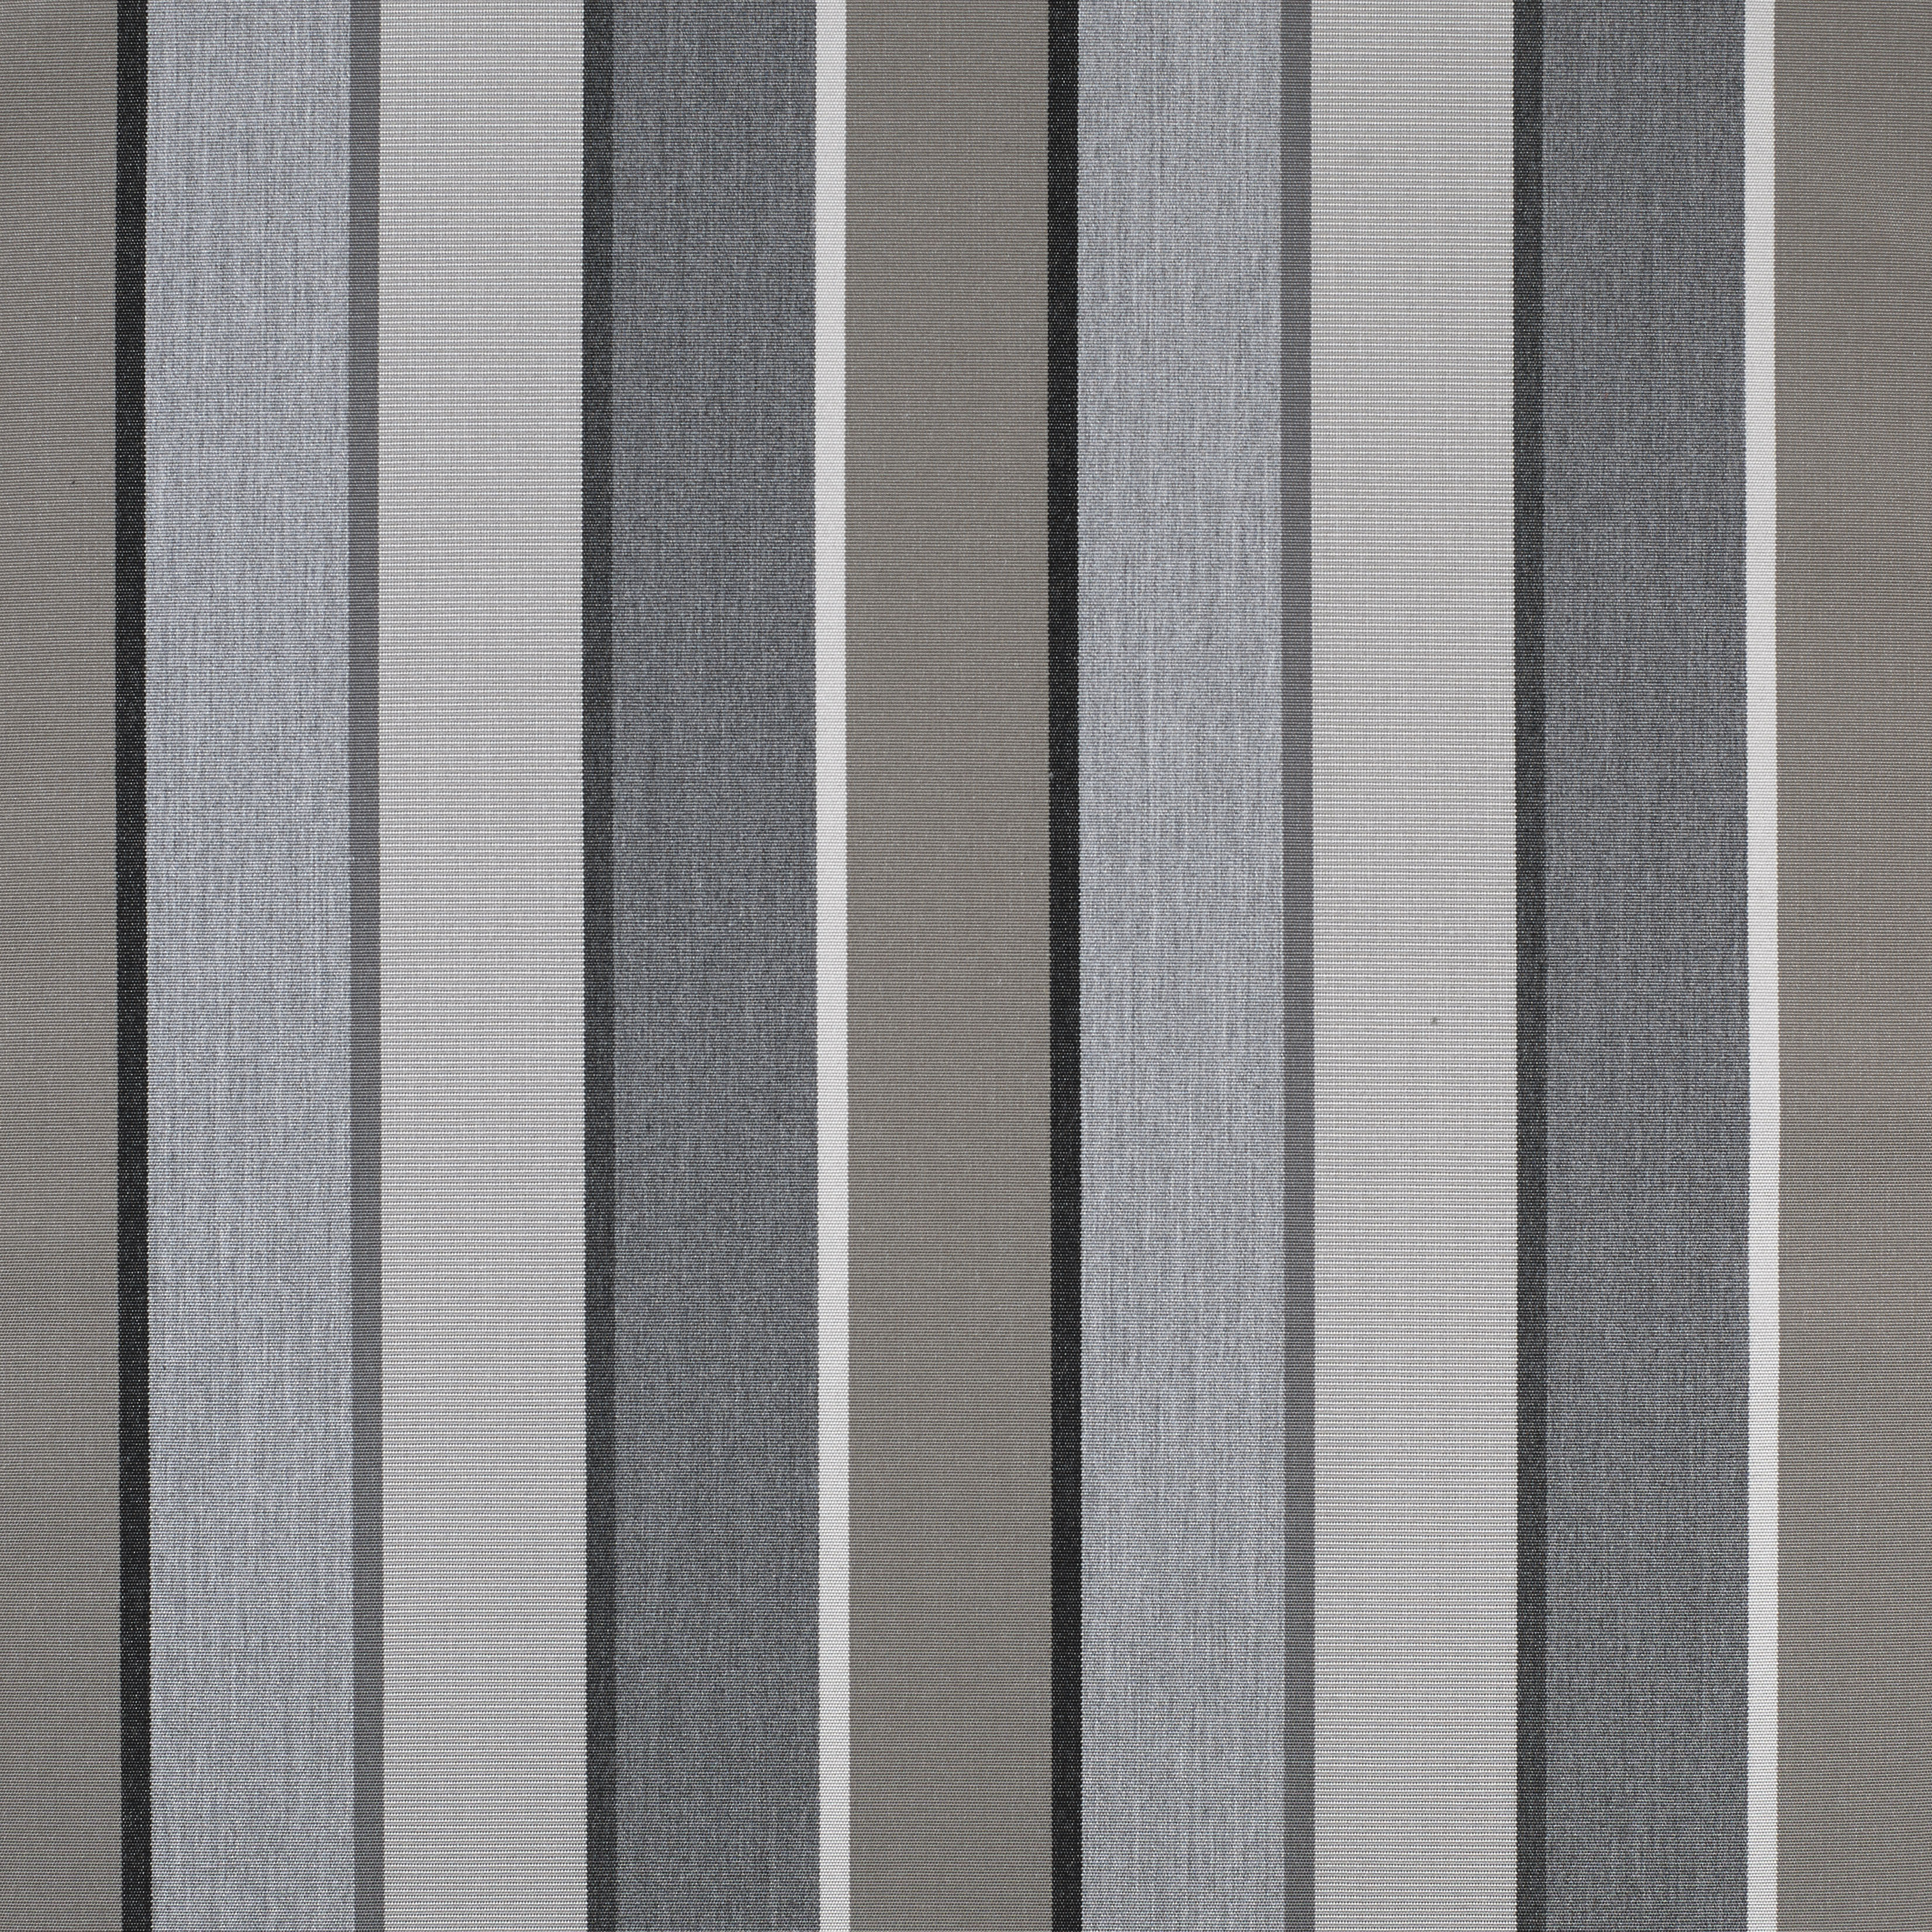 gartenmobel kettler avantgarde liege, auflagen zur serie avantgarde kettler des. 310 - gartenmöbel jendrass, Design ideen